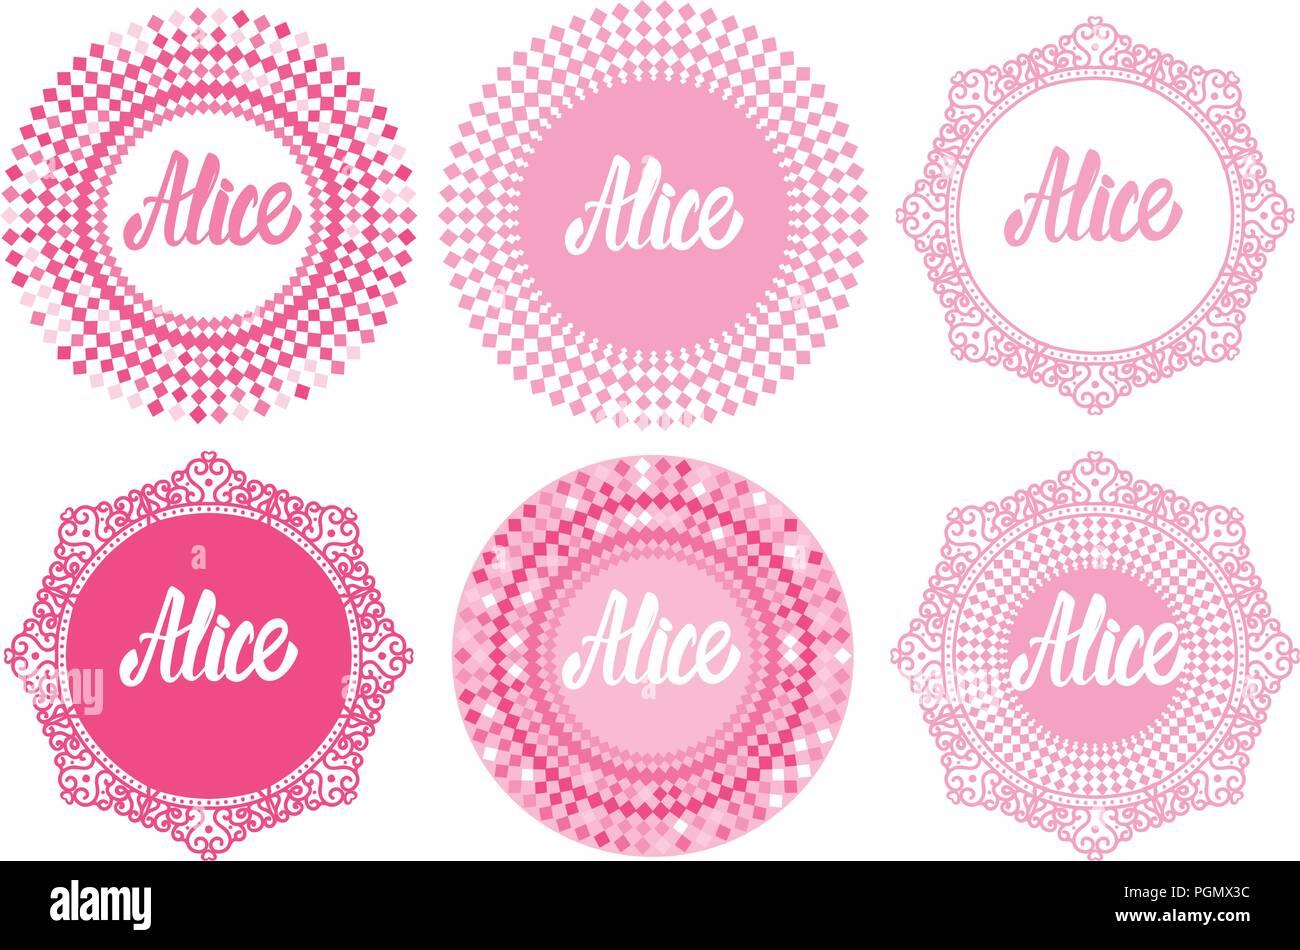 Vektor runden Rahmen Set mit letering Alice. Prinzessin girly Design ...